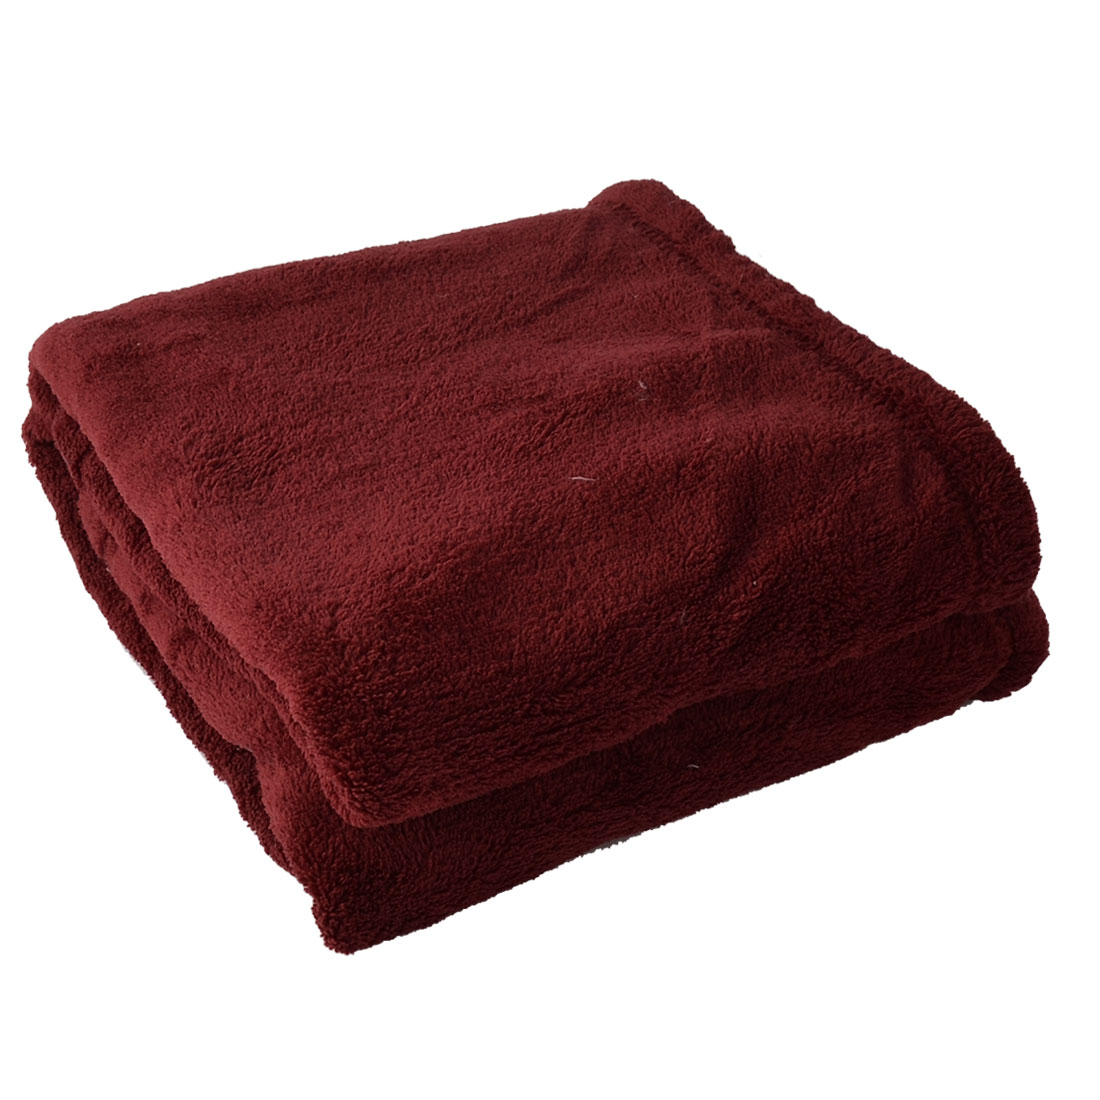 Bedroom Travel Airplane Warm Soft Pure Blanket Rug Plush Fleece Quilt Burgundy